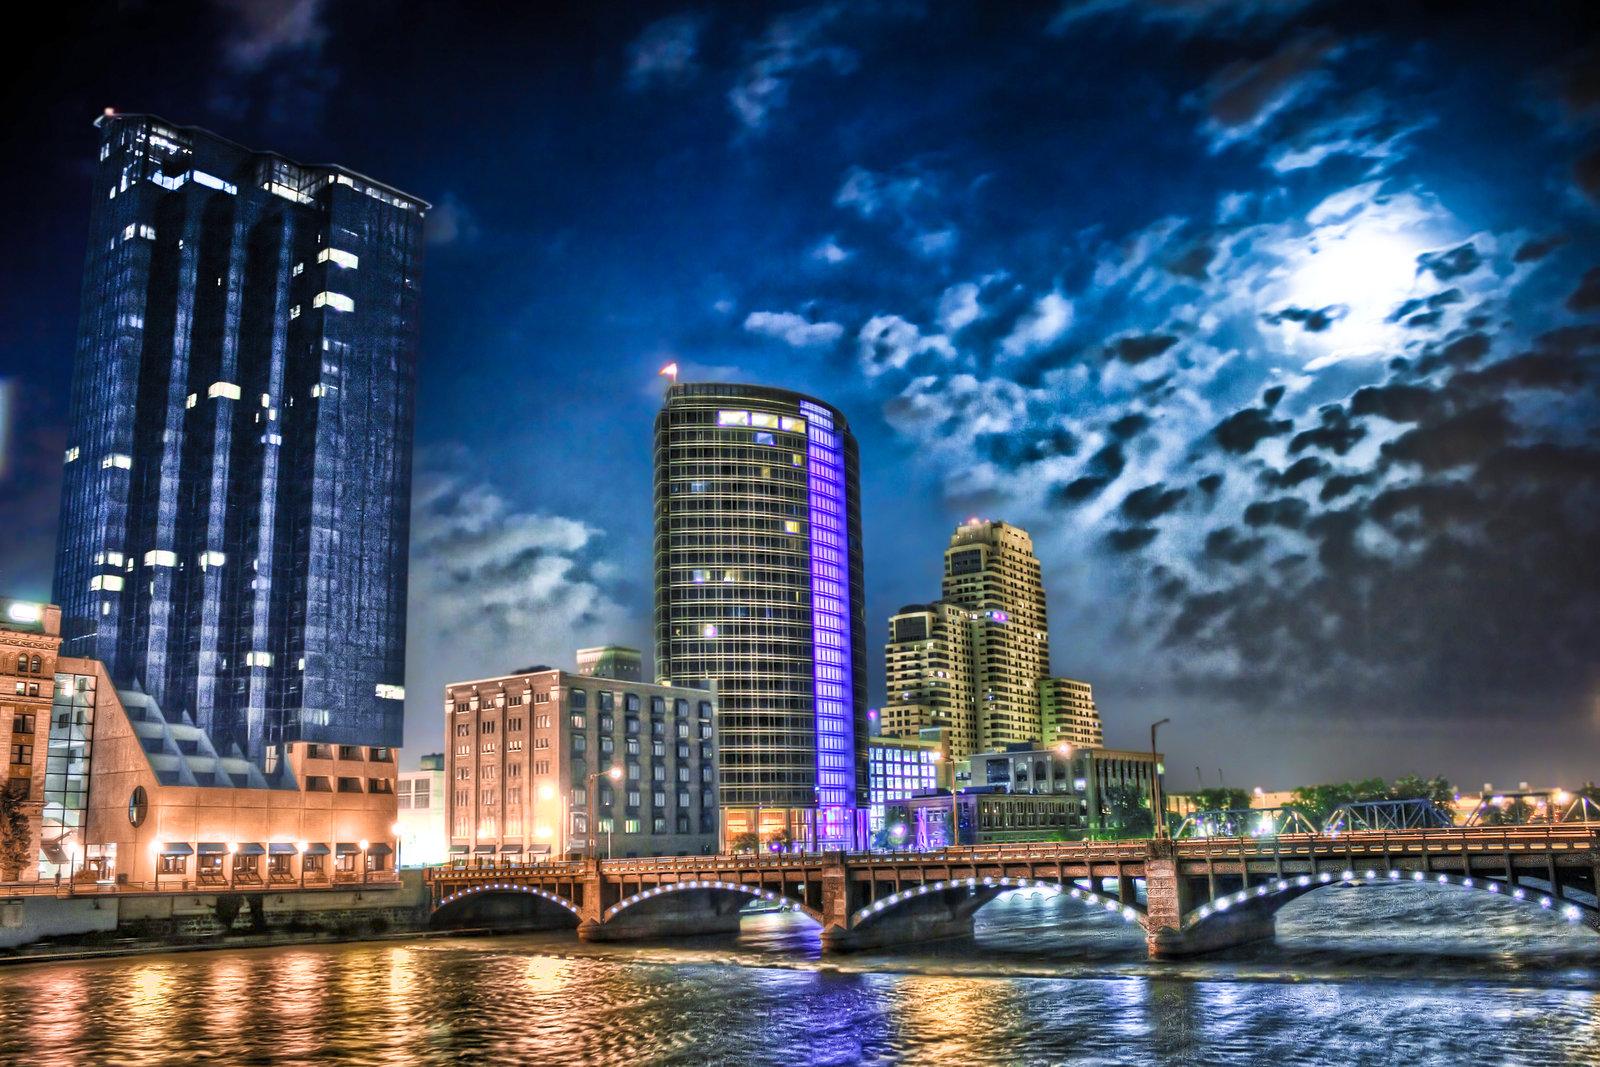 Downtown Grand Rapids by II McCloud II 1600x1067